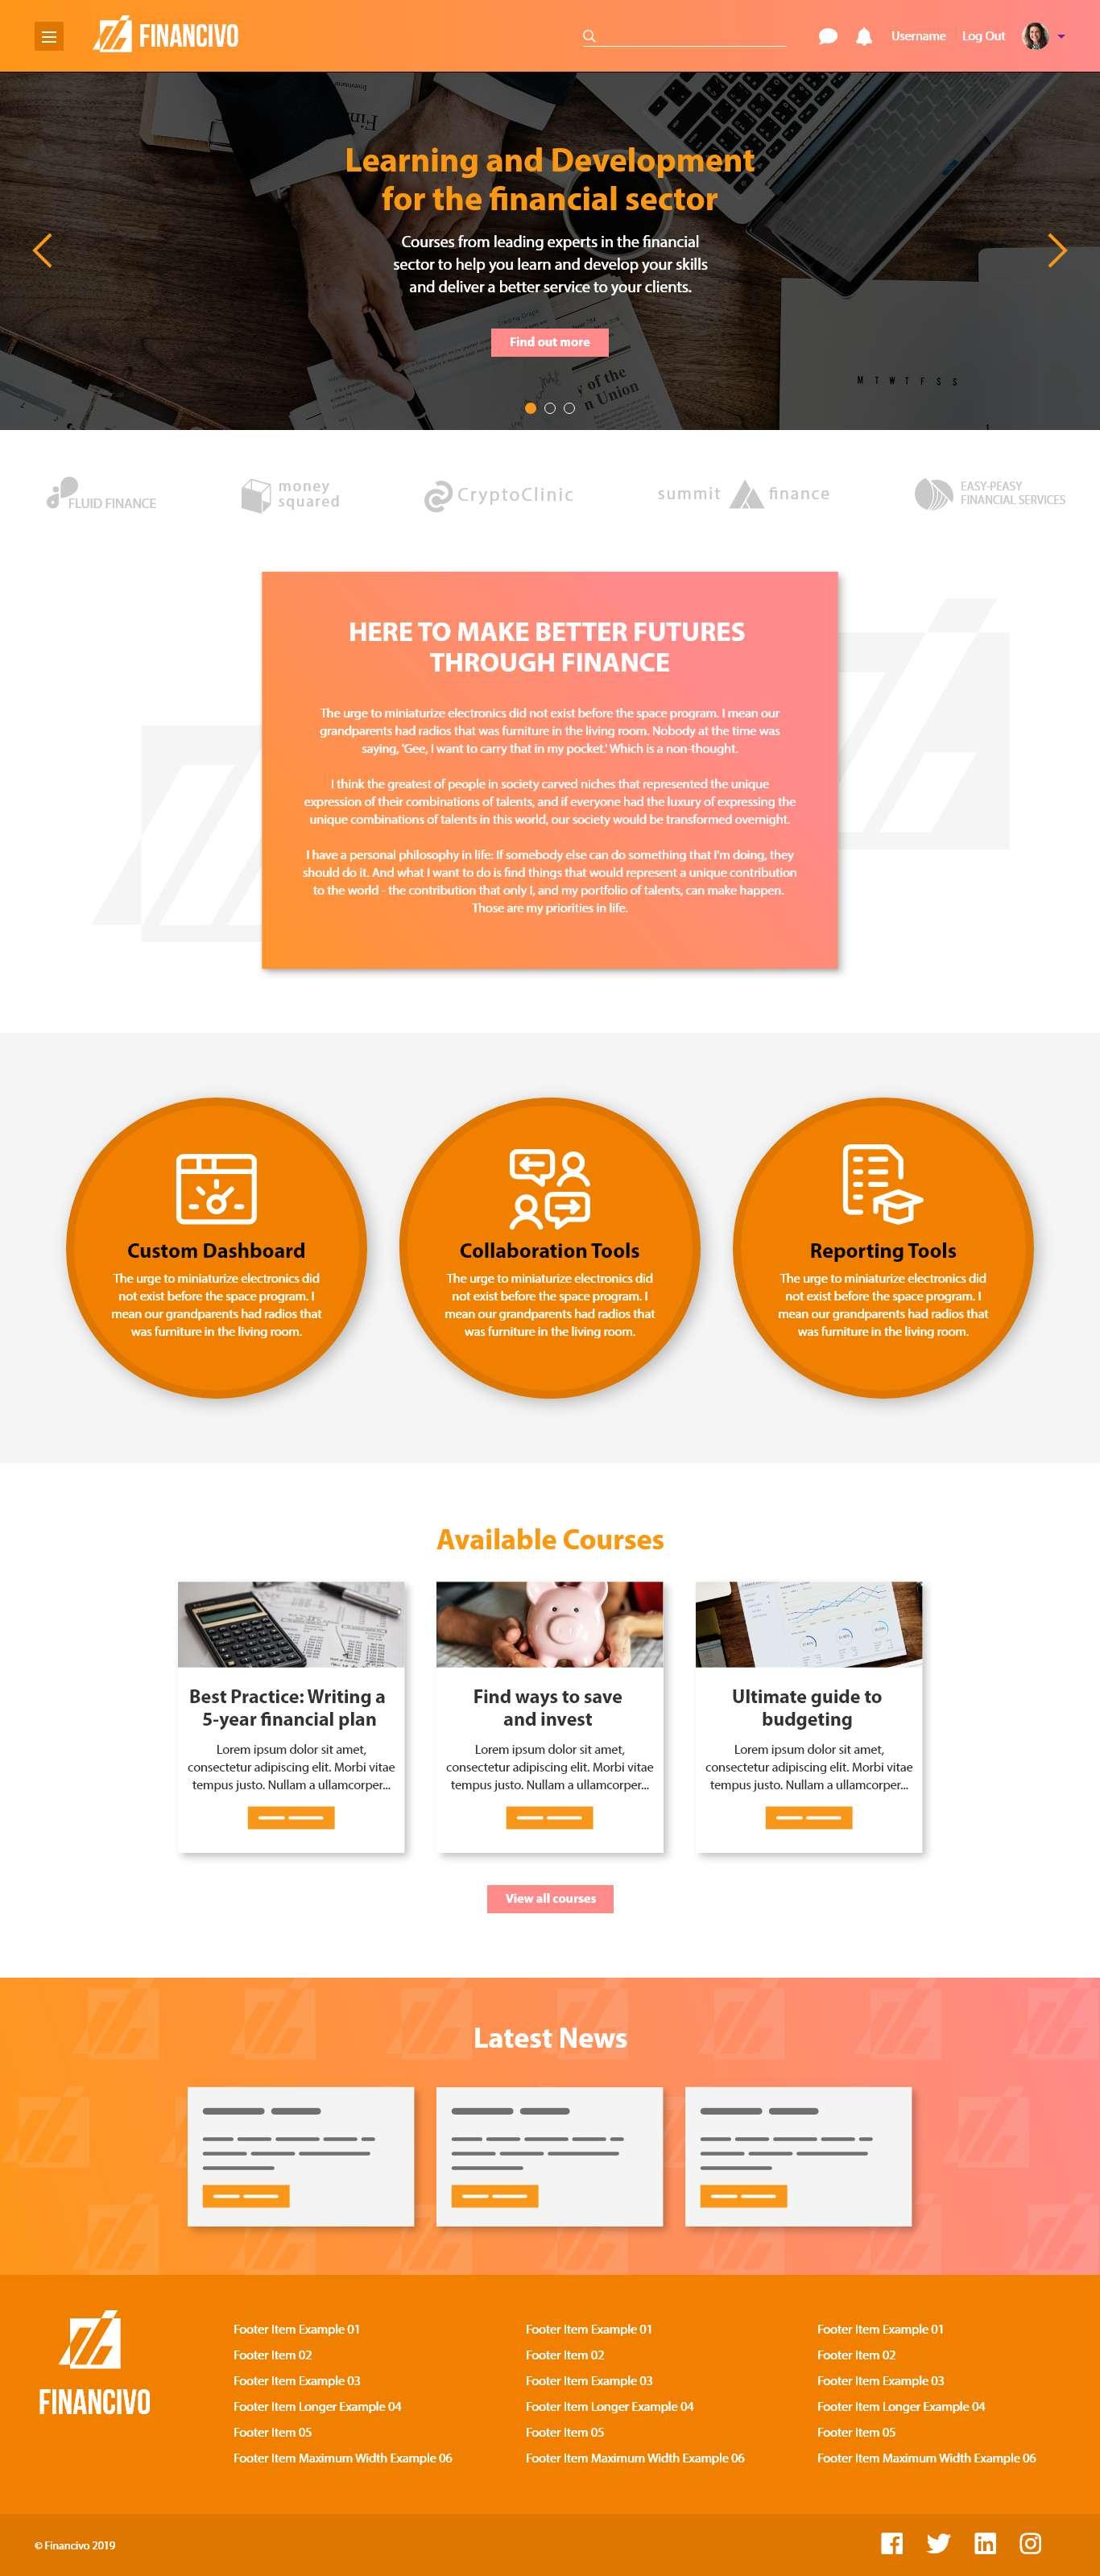 Design It - Financivo - Desktop